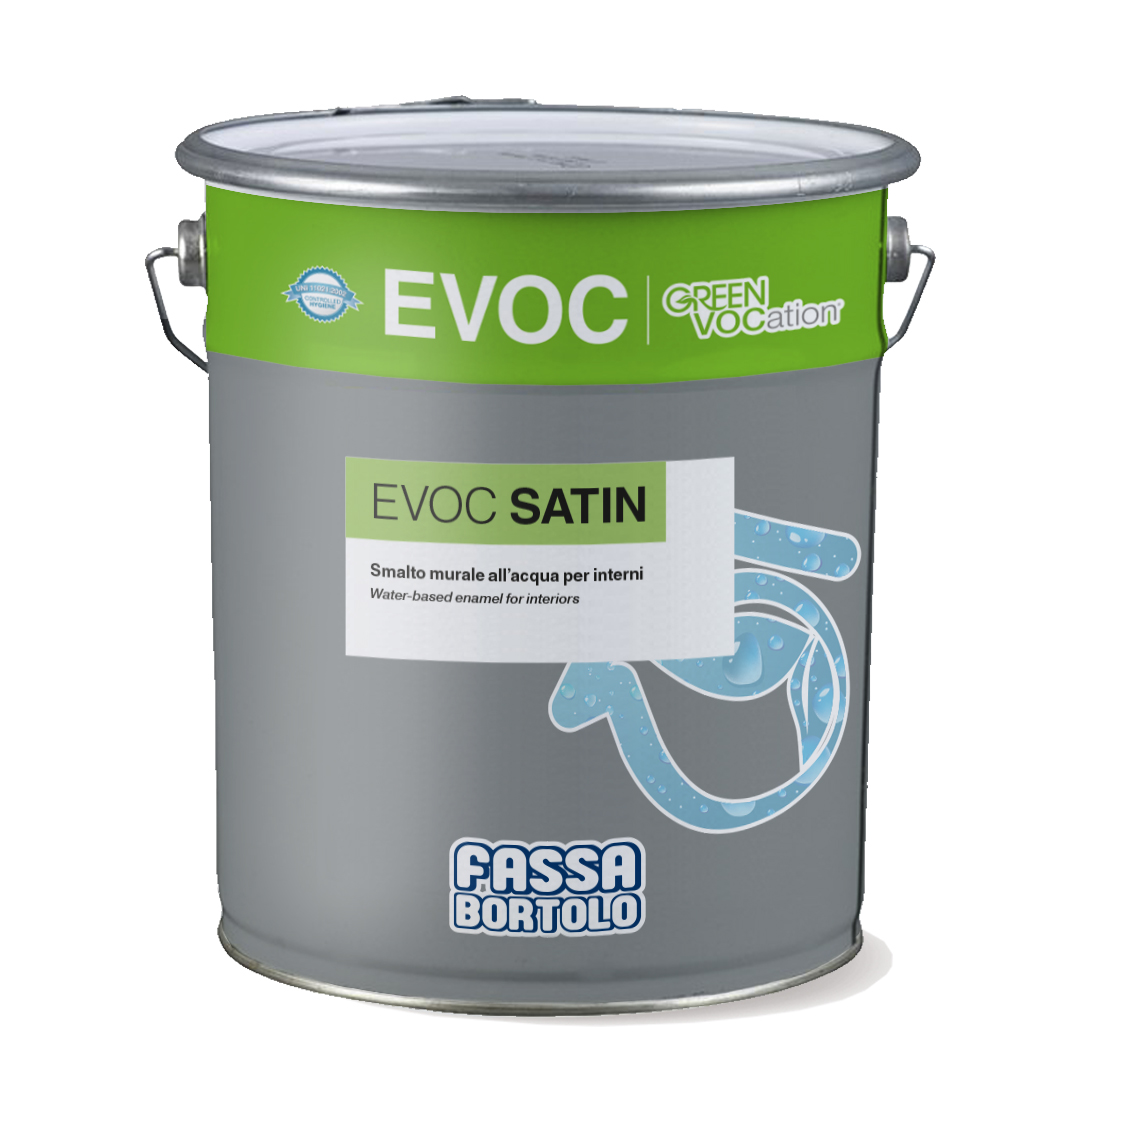 EVOC SATIN: Esmalte mural de água acetinado para interiores